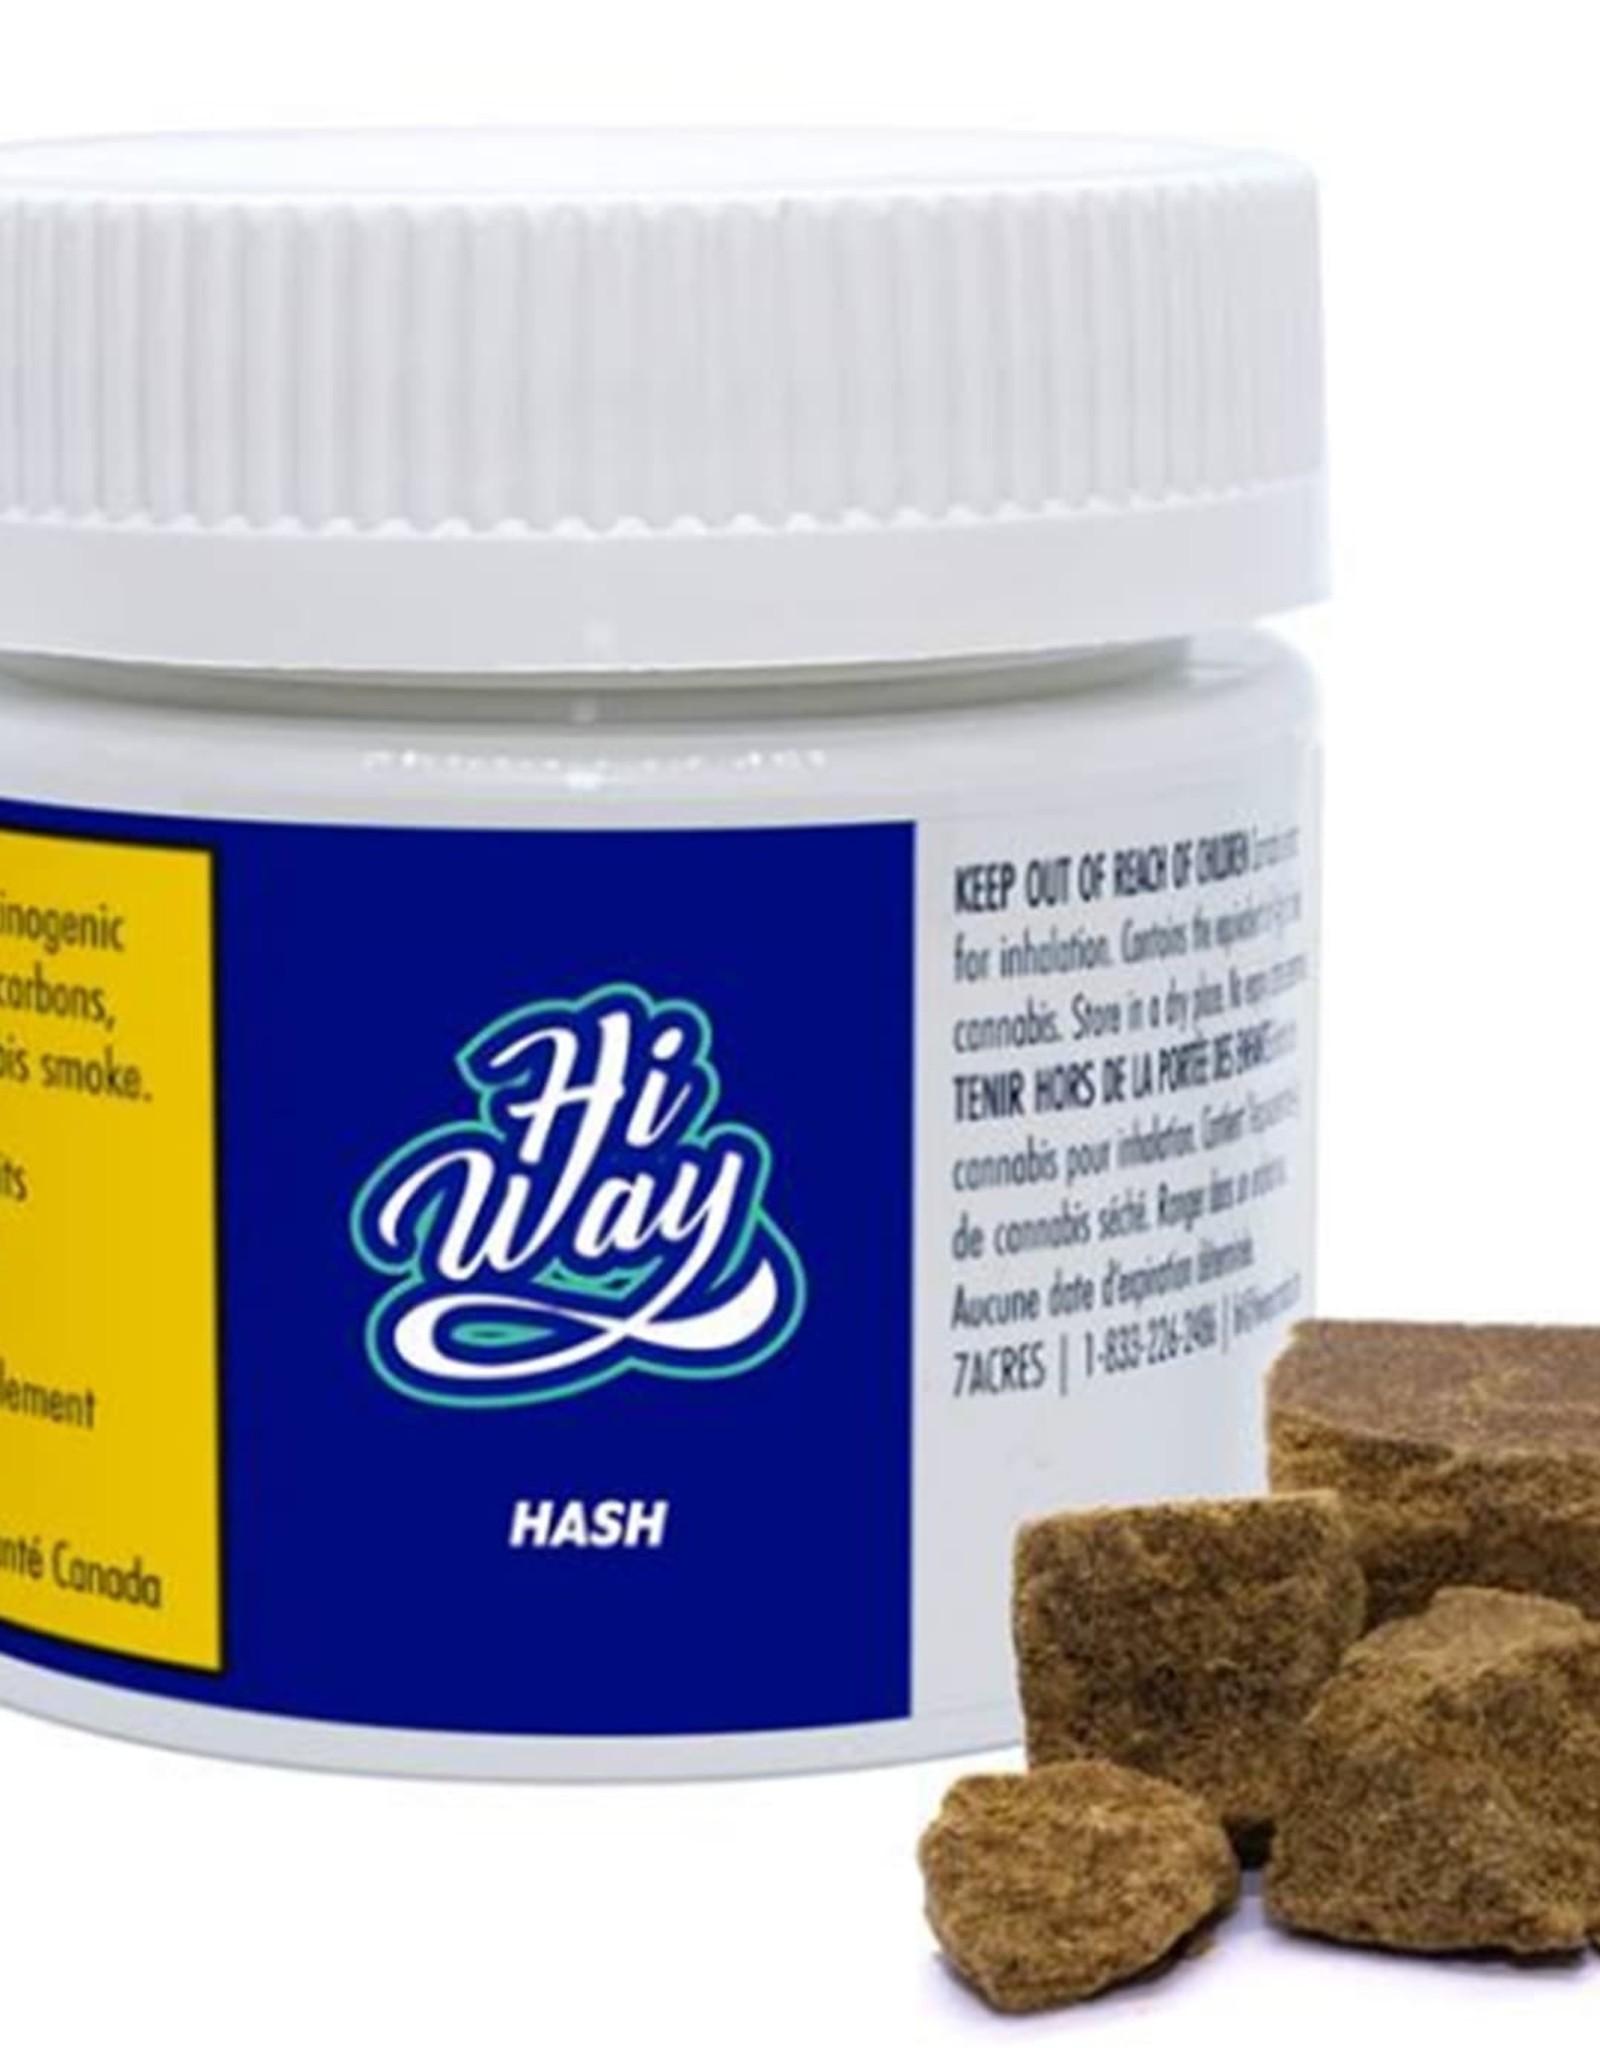 Blissco. Blissco - Hiway Hash 2G